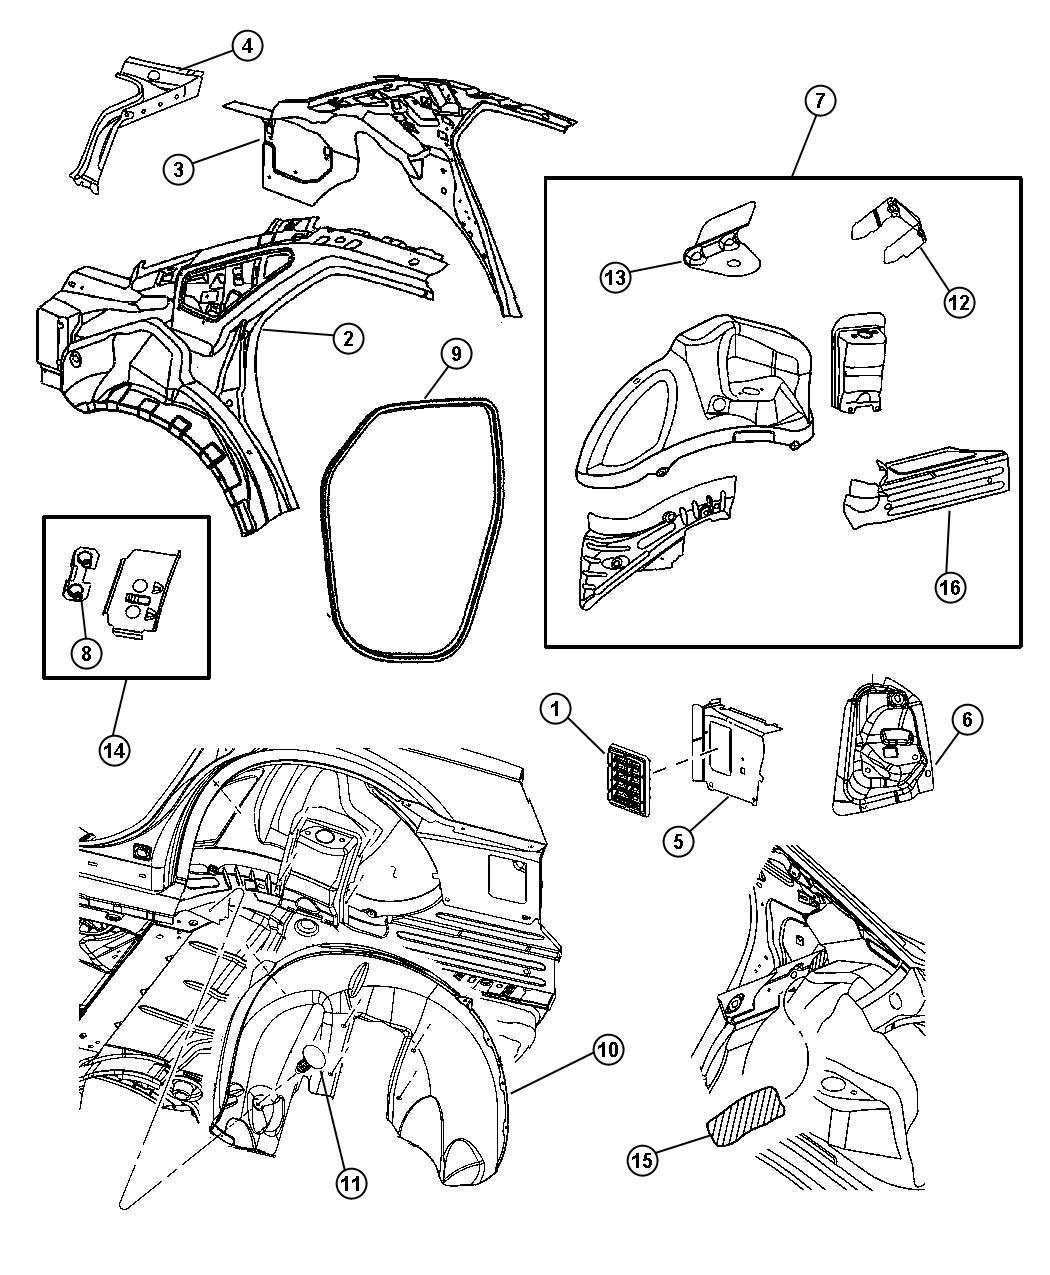 Dodge Pin Push In M8 X 1 25 X 20 Fascia Attaching Fascia To Quarter Panel